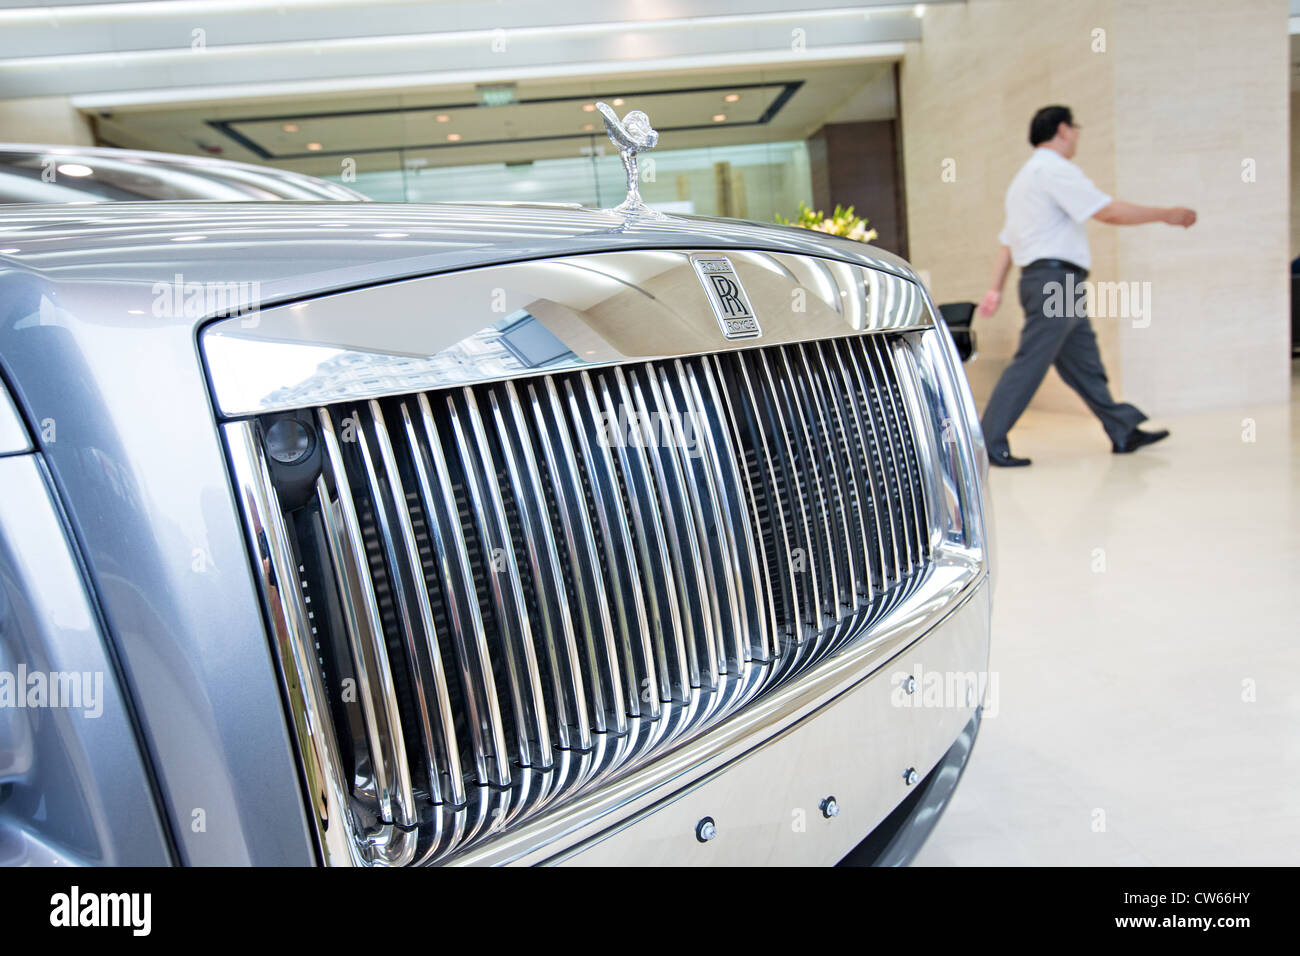 Rolls Royce Showroom Stock Photos Amp Rolls Royce Showroom Stock Images Alamy